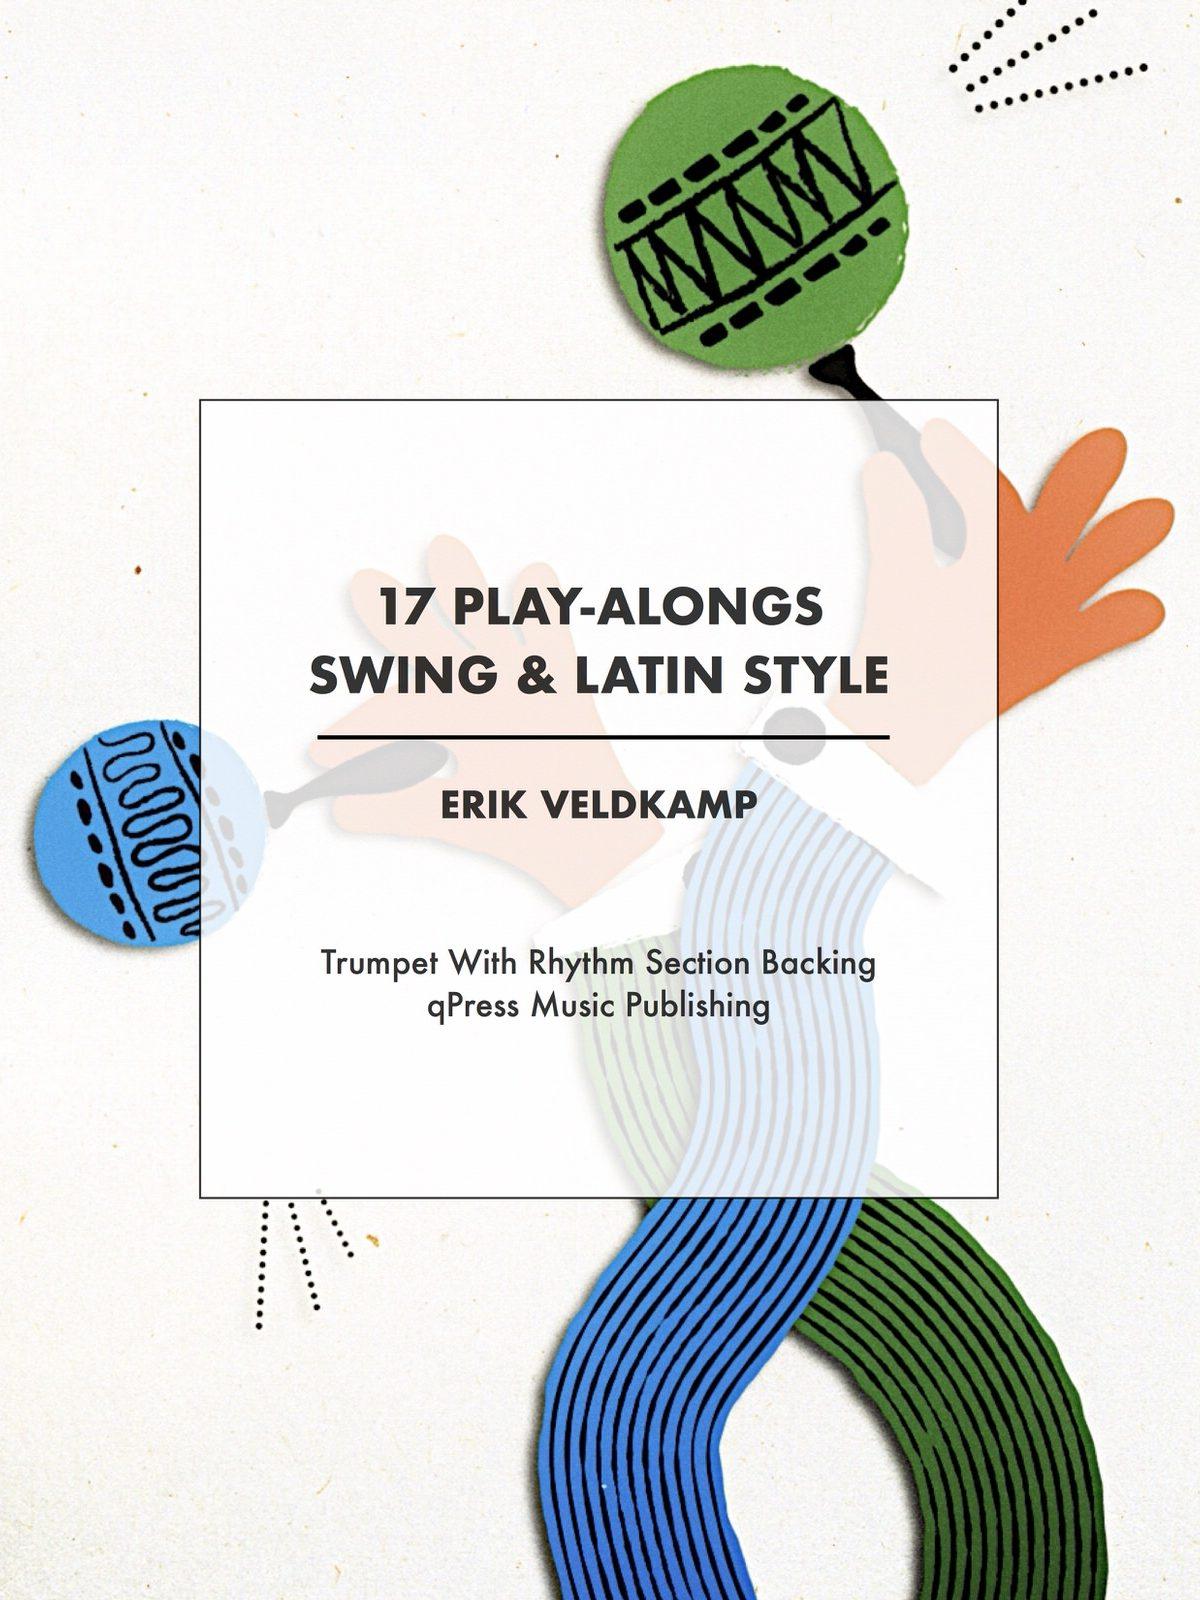 Veldkamp, 17 Play-Alongs in Swing & Latin Style-p01